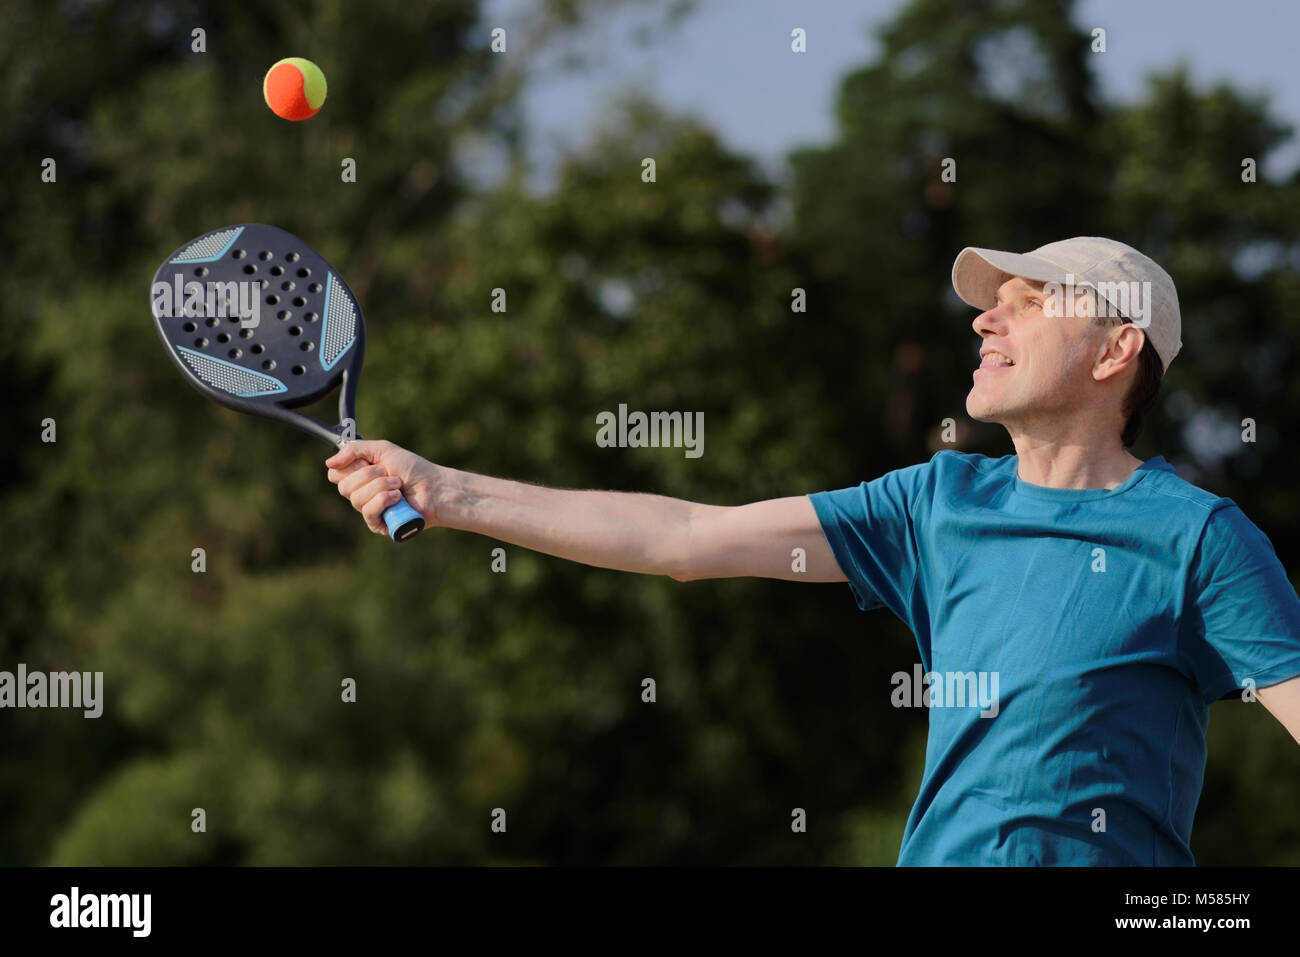 Mature man playing beach tennis on a beach - Stock Image